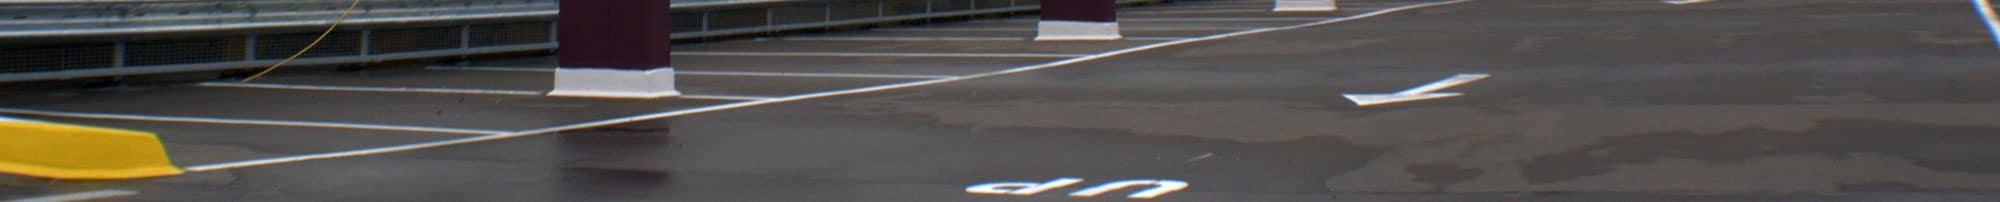 Cemplas - Banner - Car Park Refurbishment - Image 1